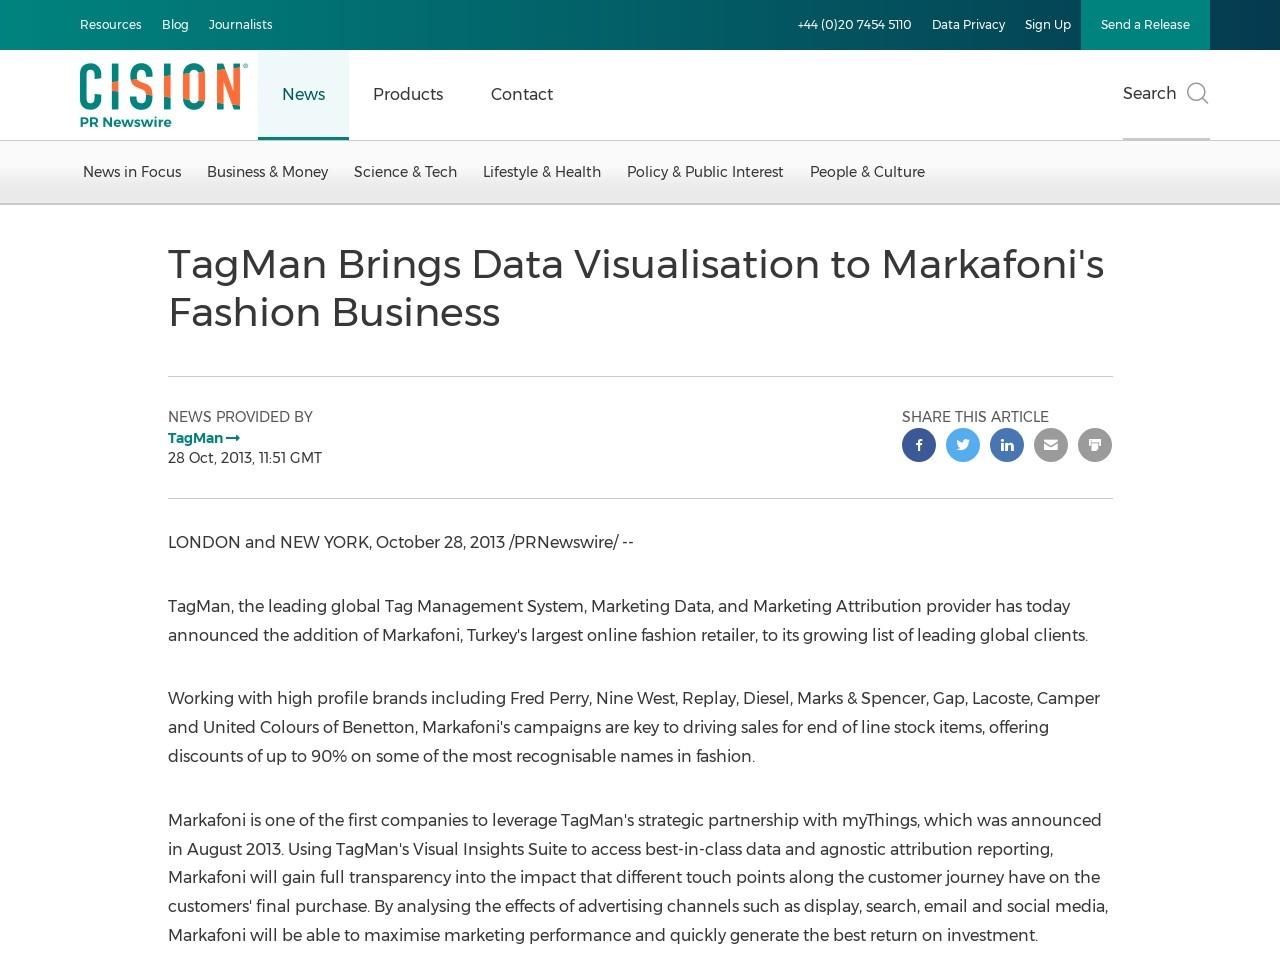 TagMan Brings Data Visualisation to Markafoni's Fashion Business